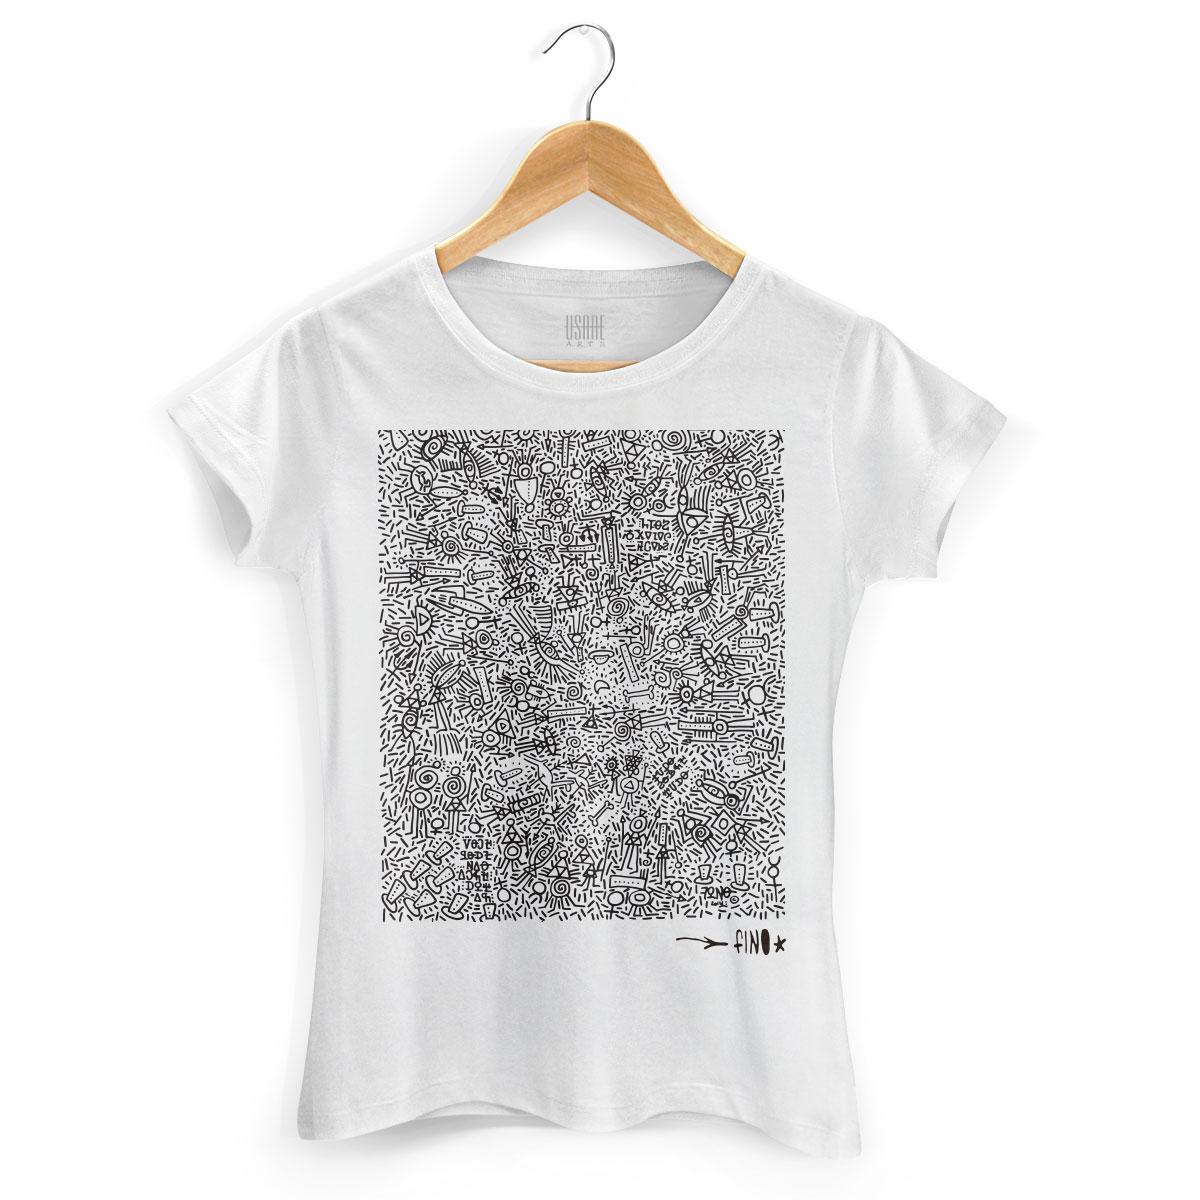 Camiseta Feminina Fino Farofa de Religião